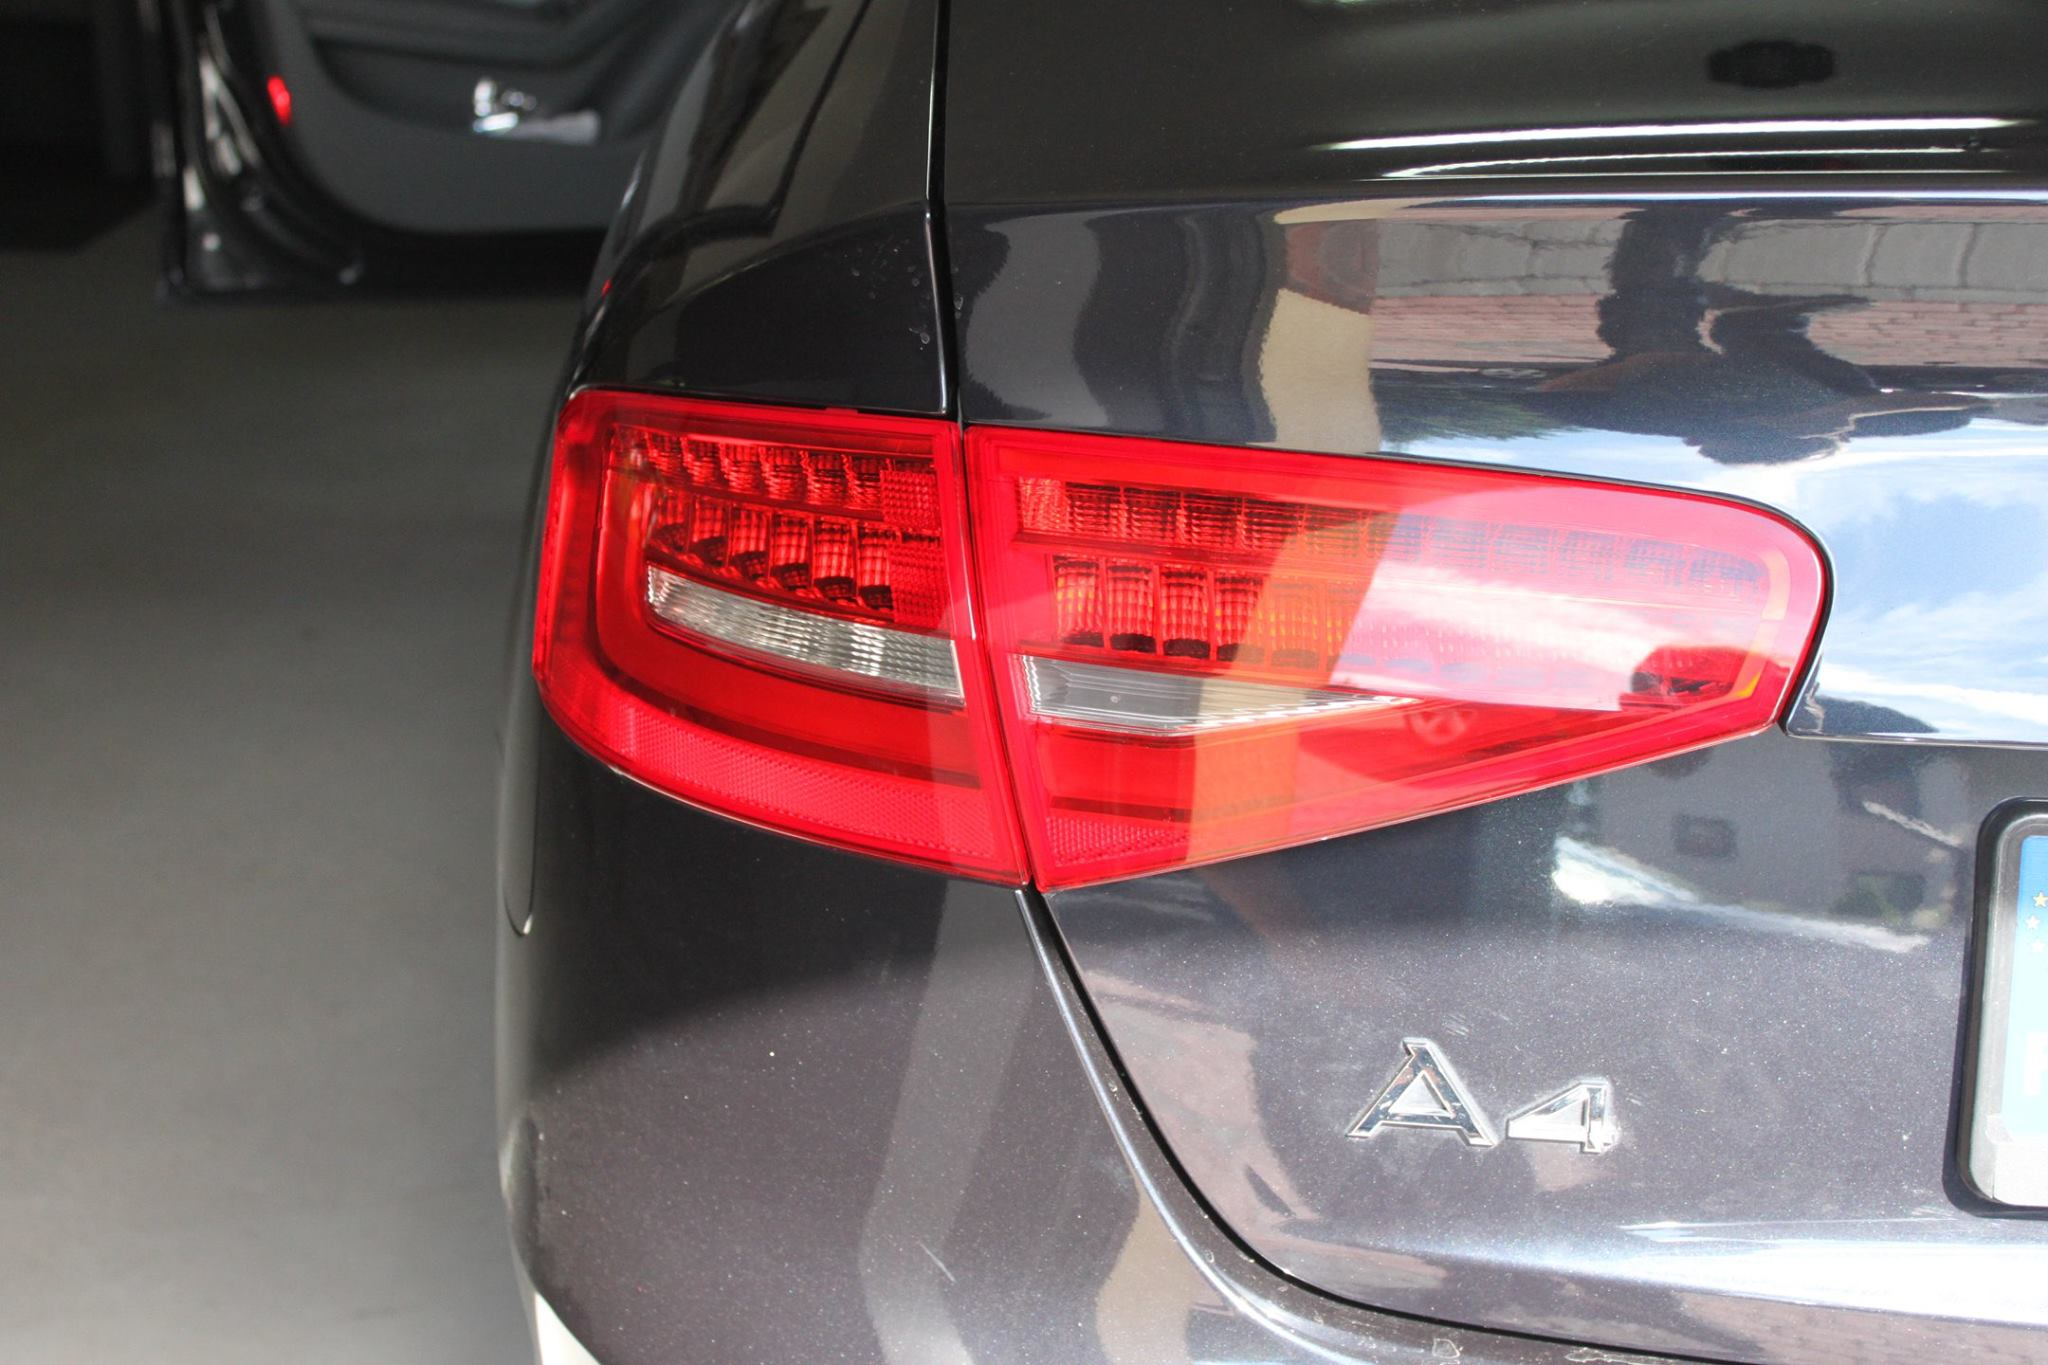 AUDI A4 B8 LIFT 2015 2.0 TFSI